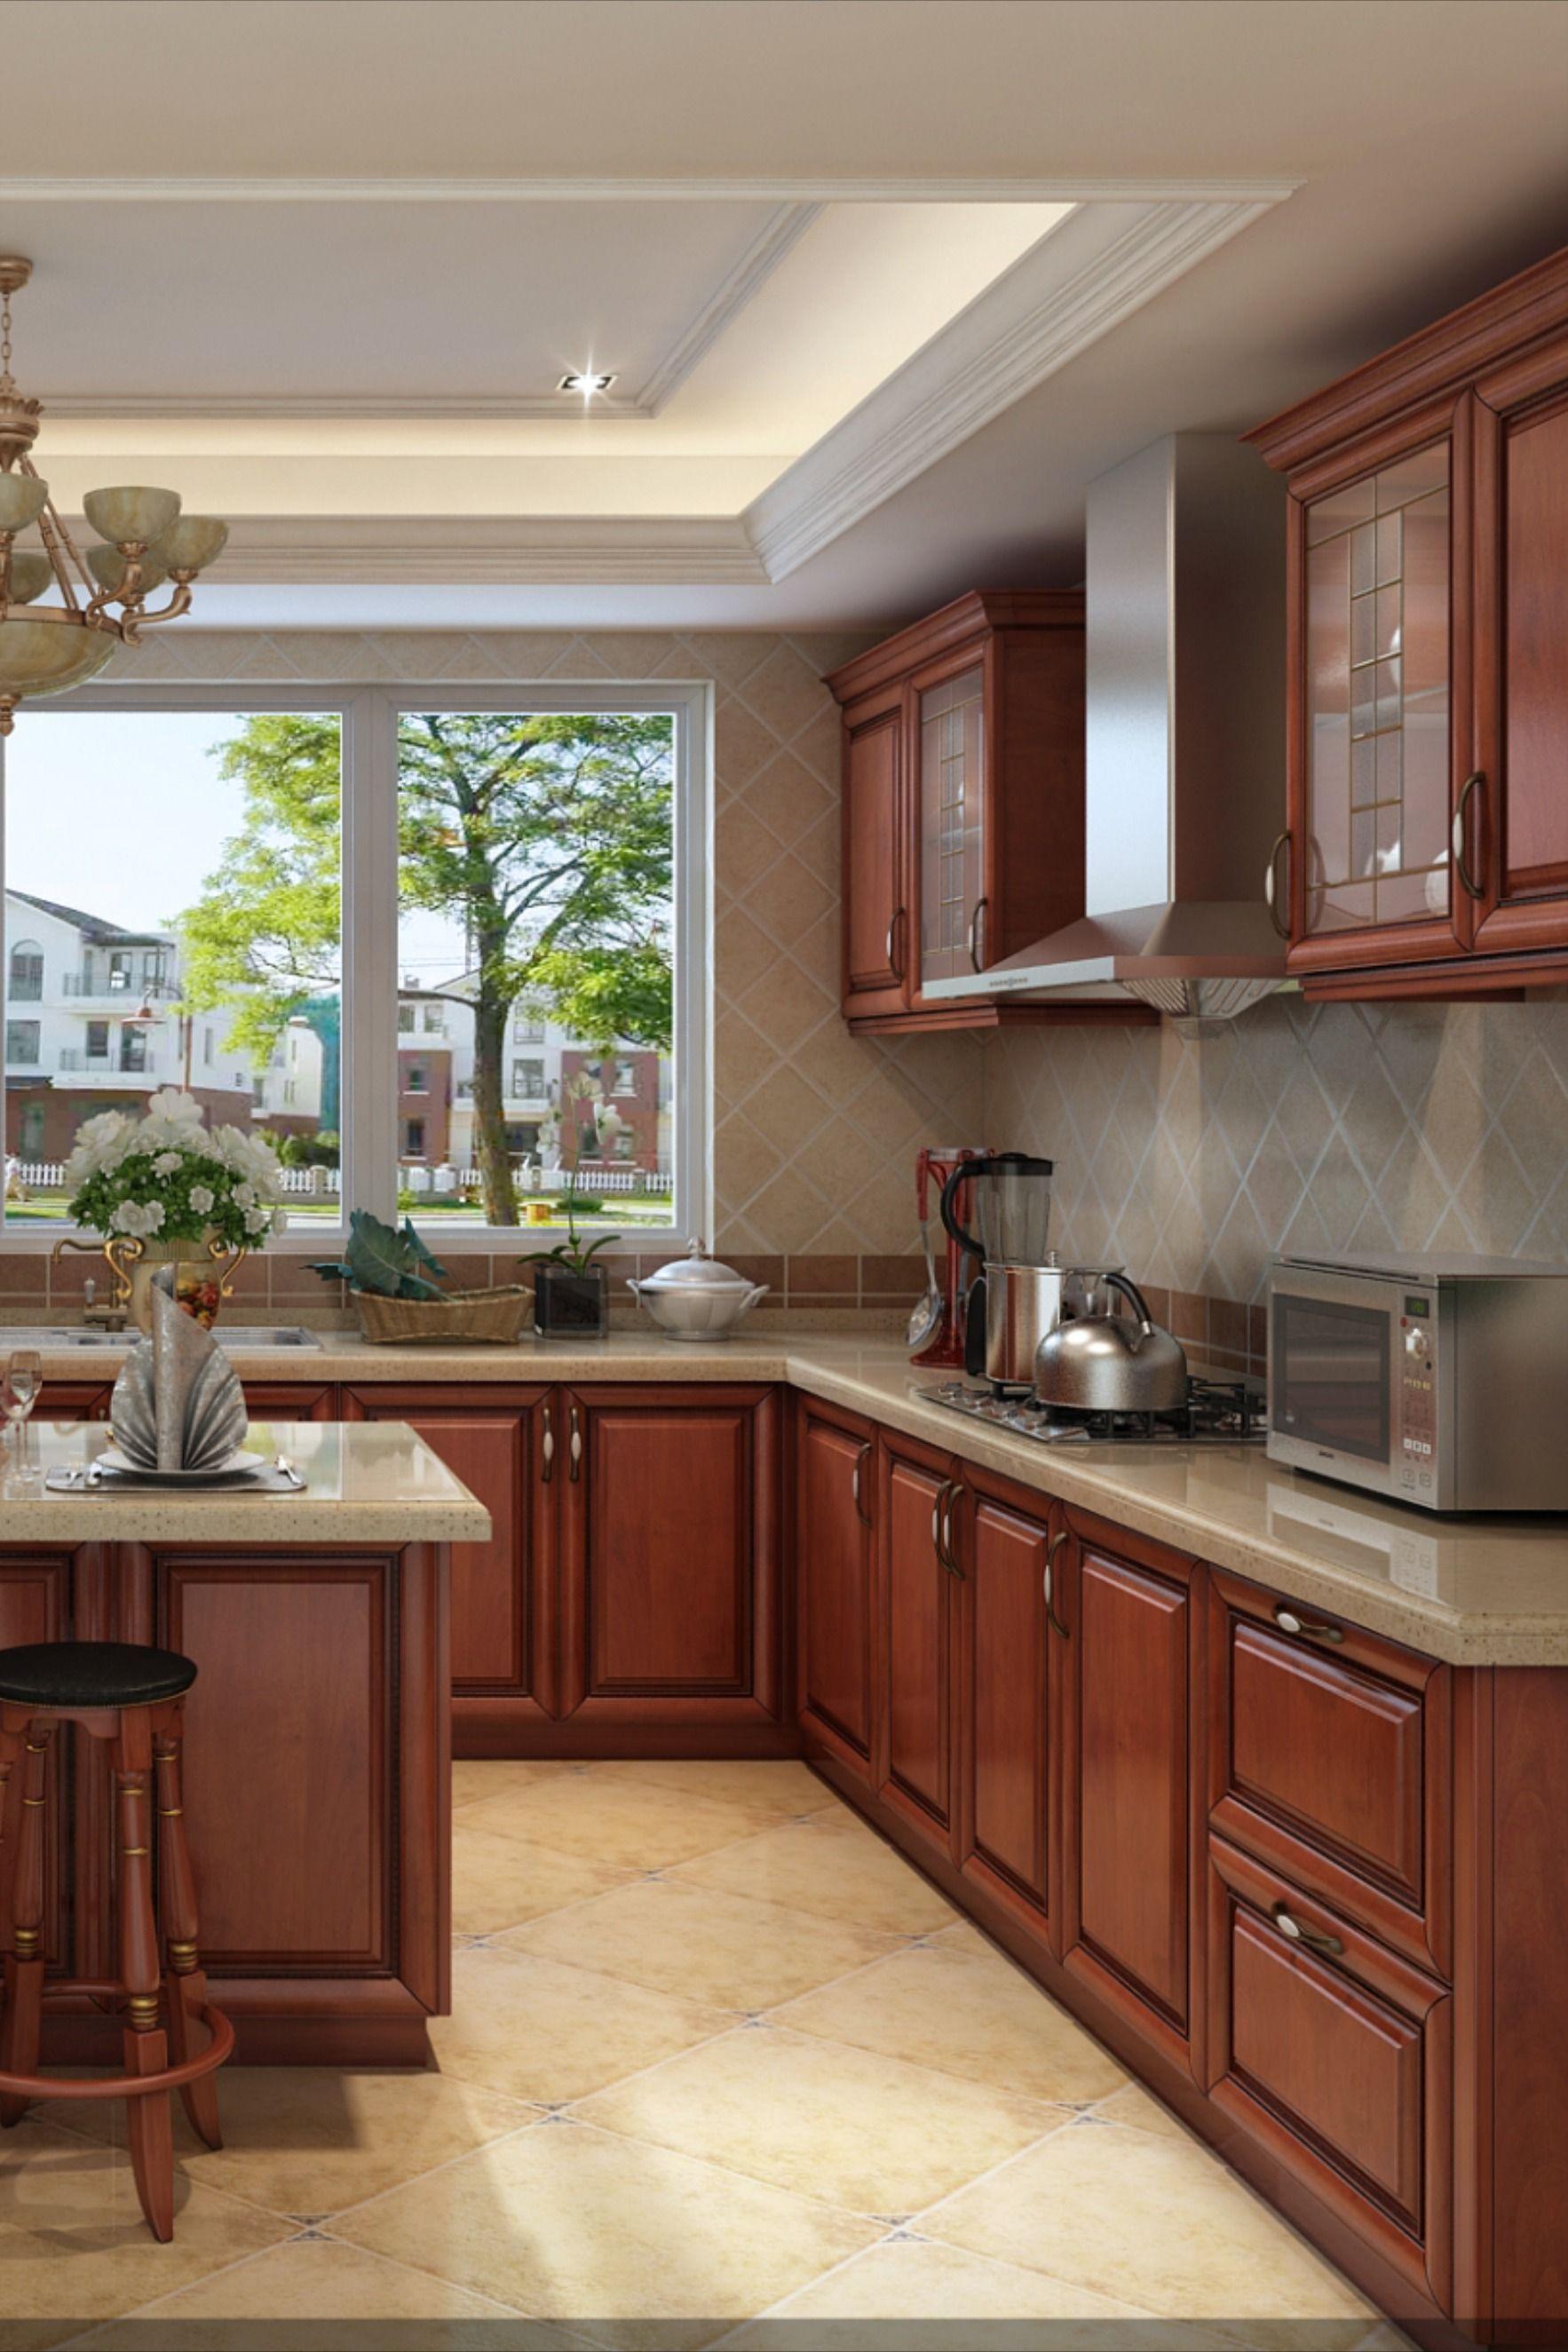 Pvc Blister Kitchen Cabinet Kitchen Cabinets Kitchen Kitchen Design